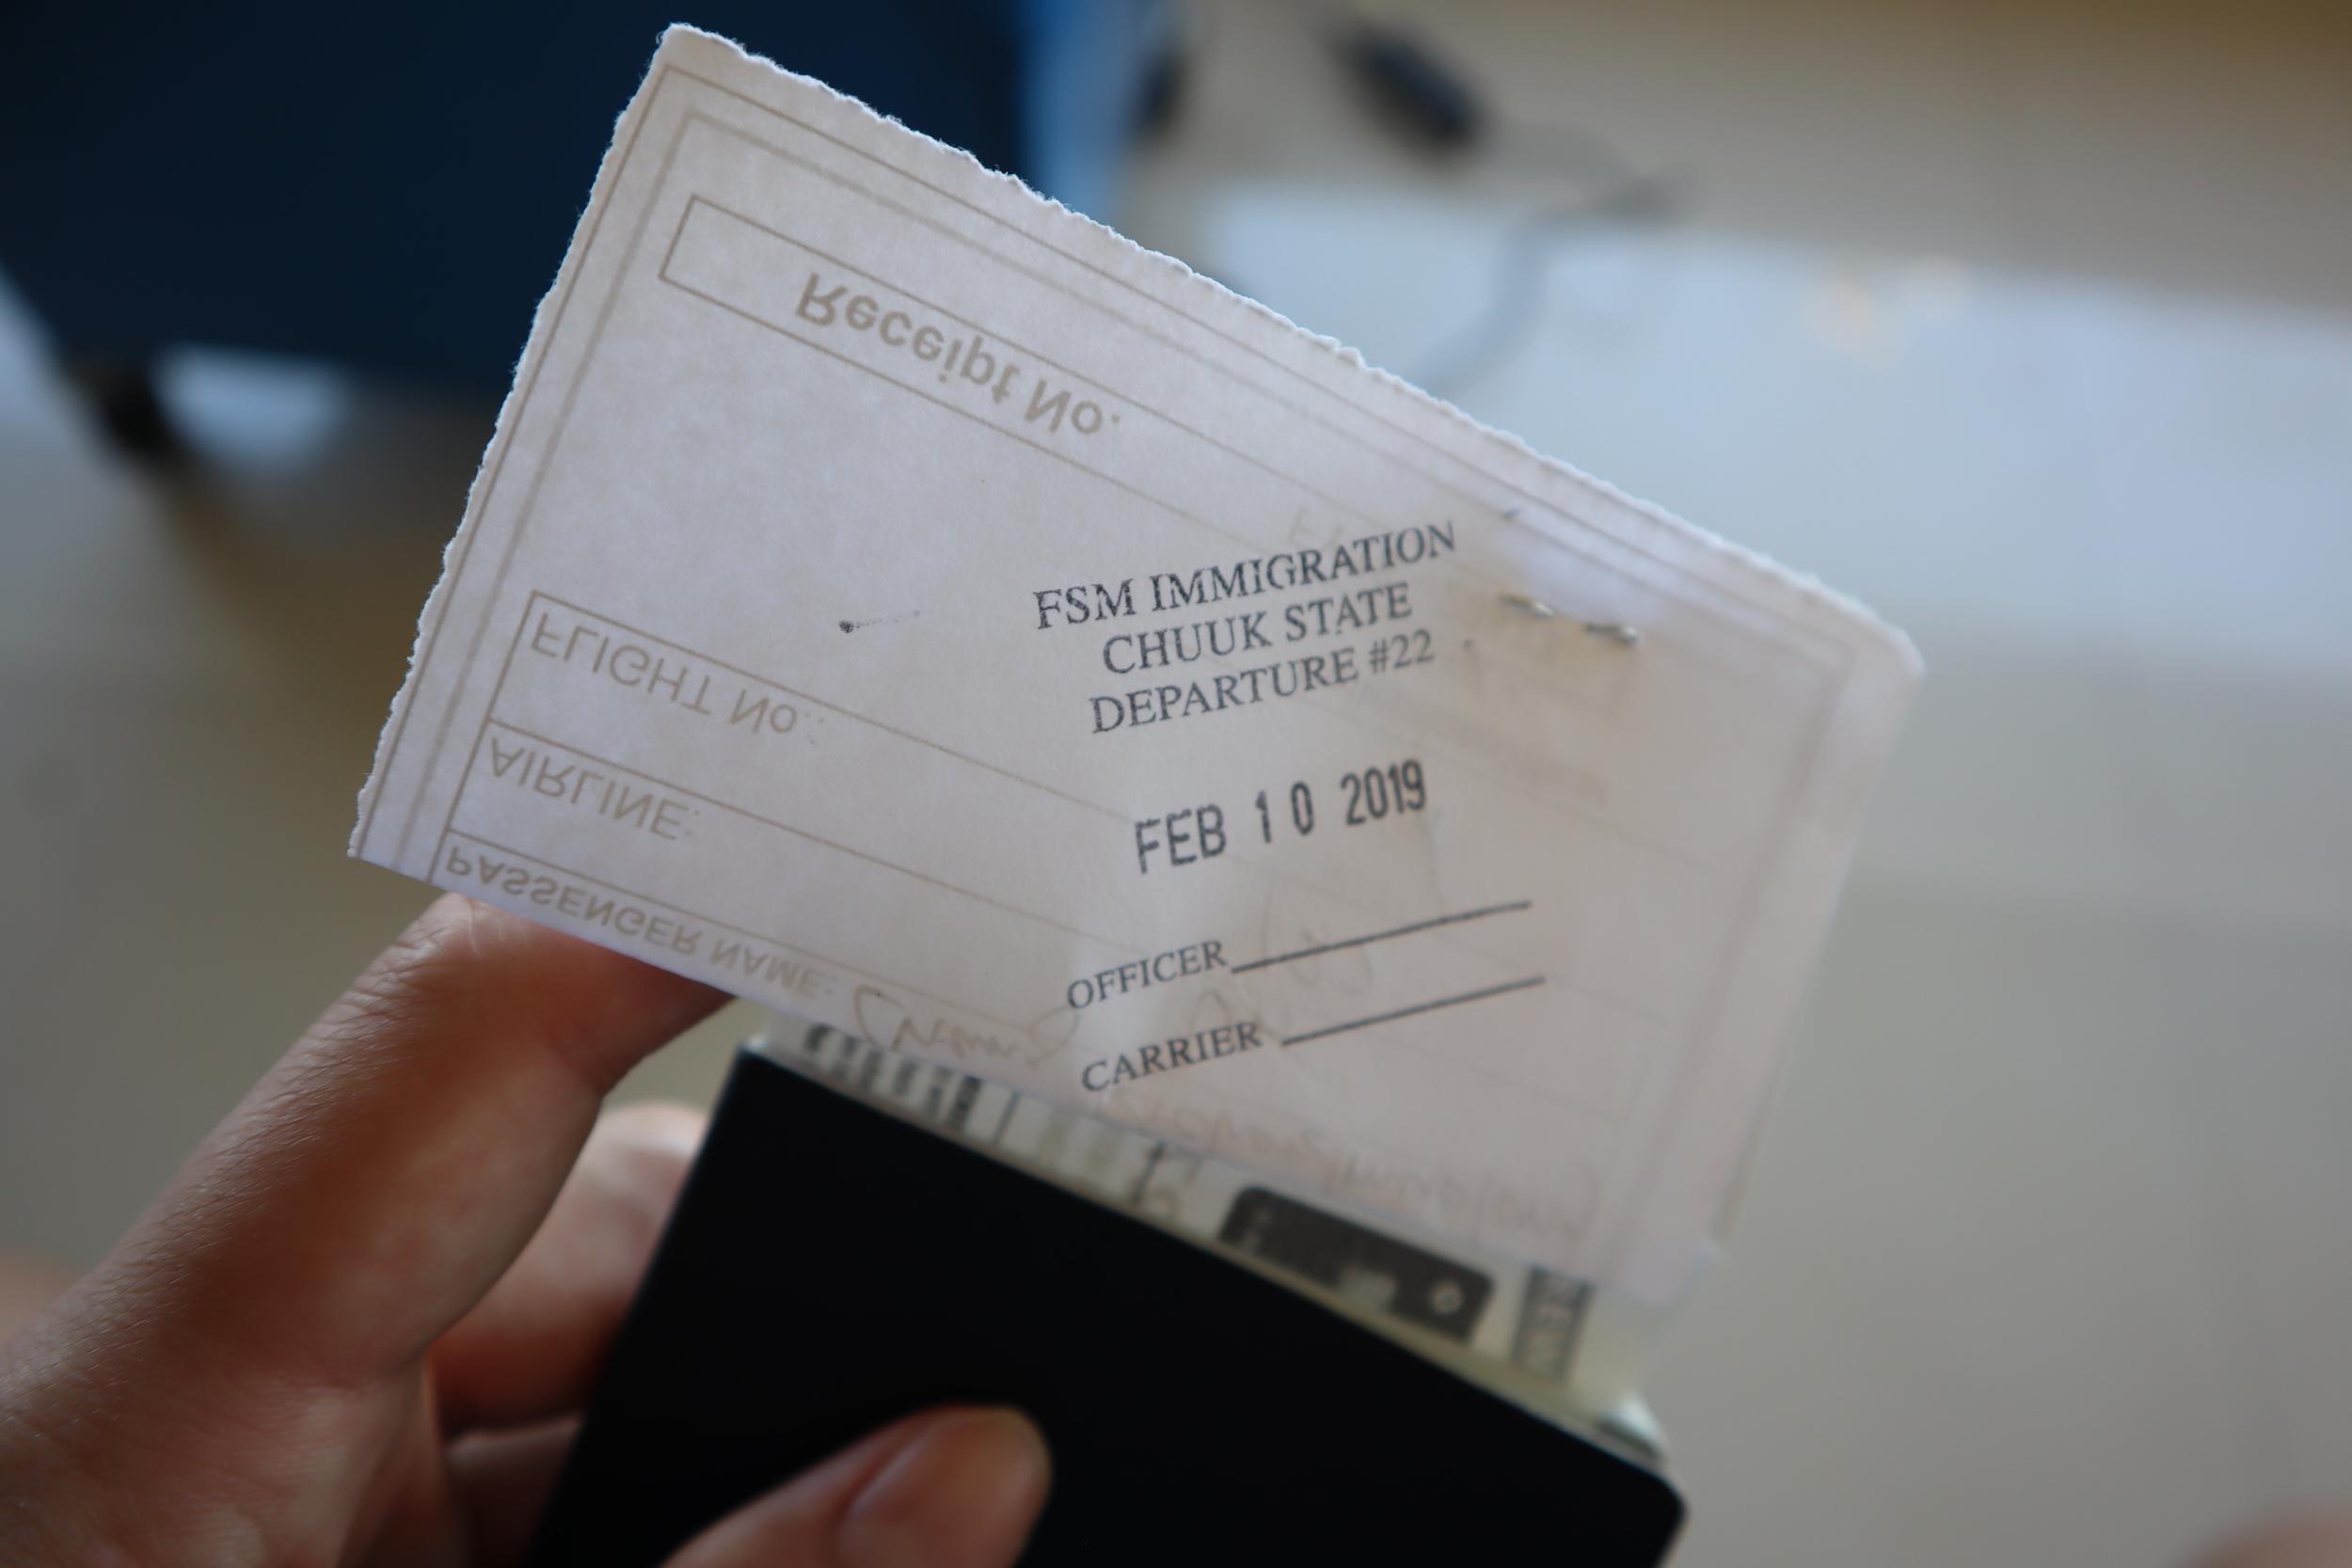 Chuuk FSM exit stamp